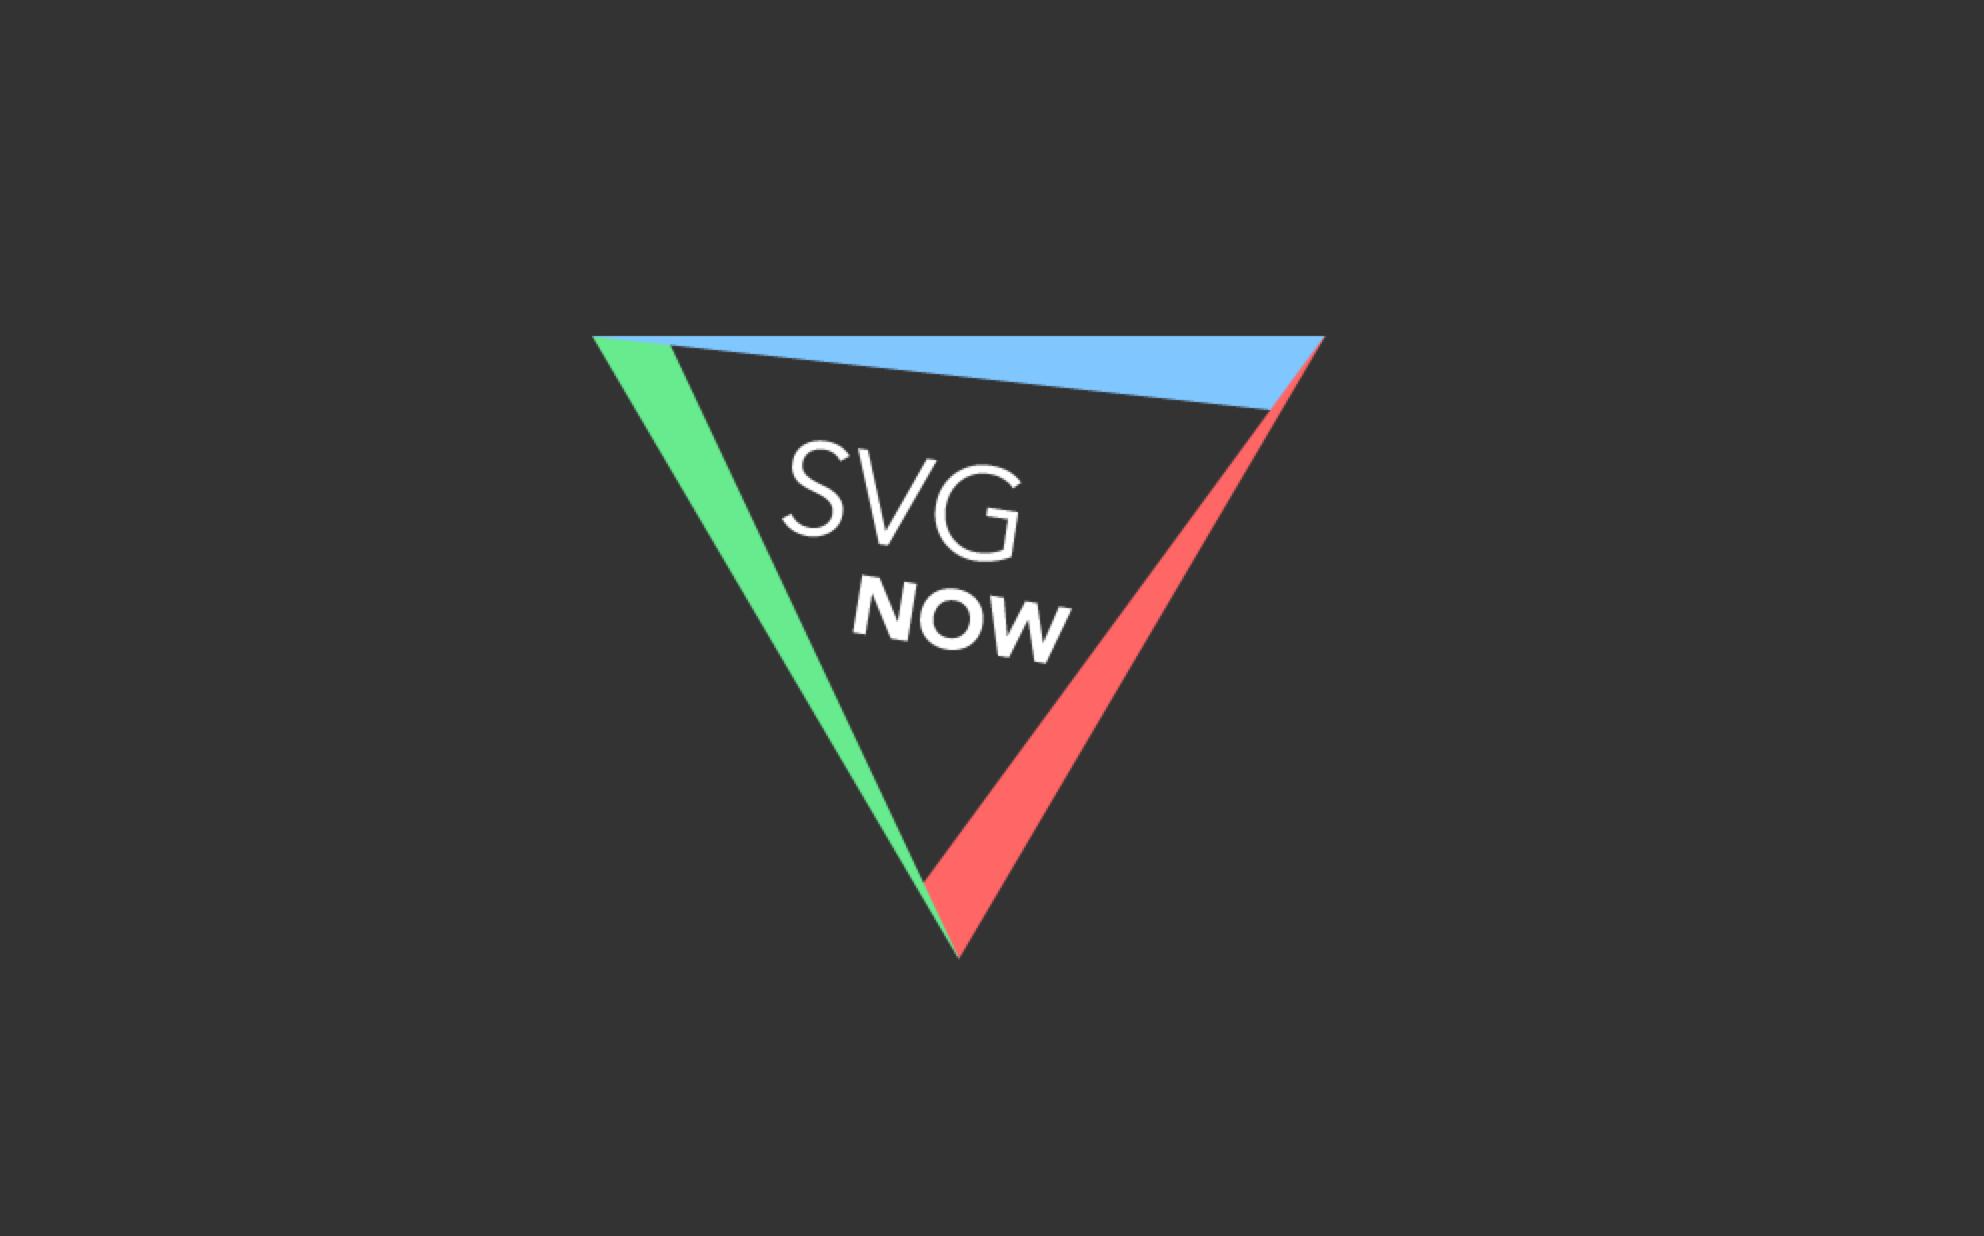 SVG NOW plugin logo.